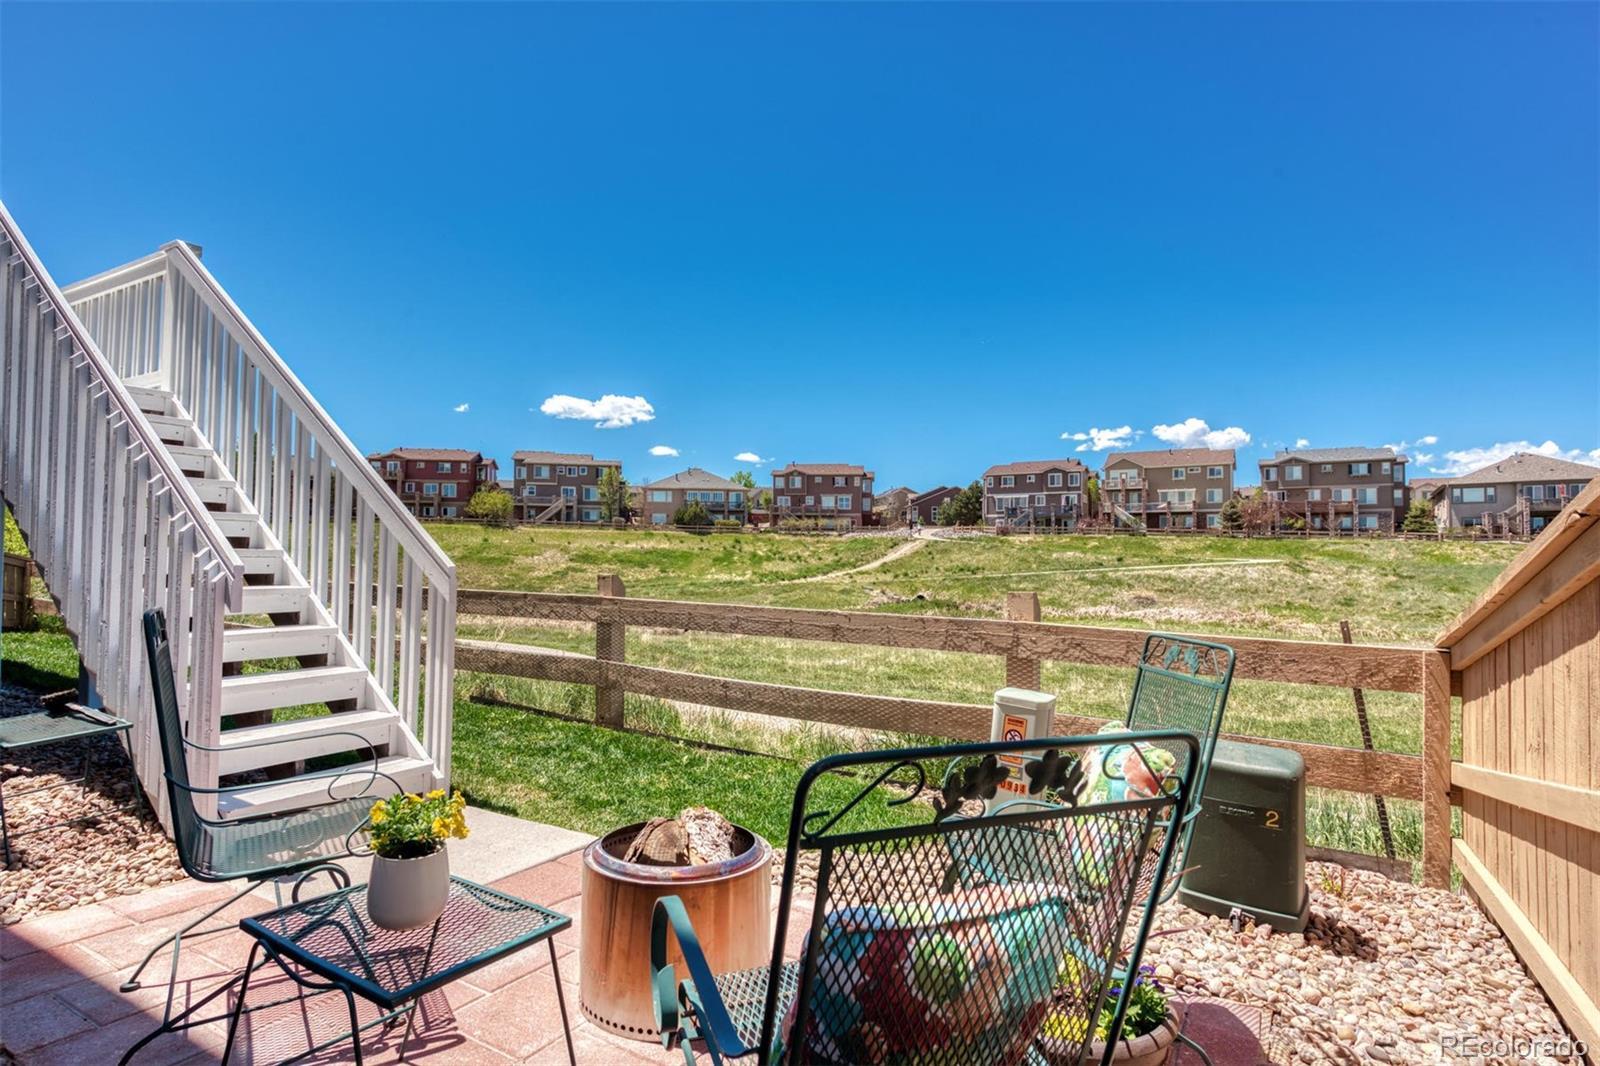 MLS# 2312037 - 38 - 10934 Towerbridge Road, Highlands Ranch, CO 80130